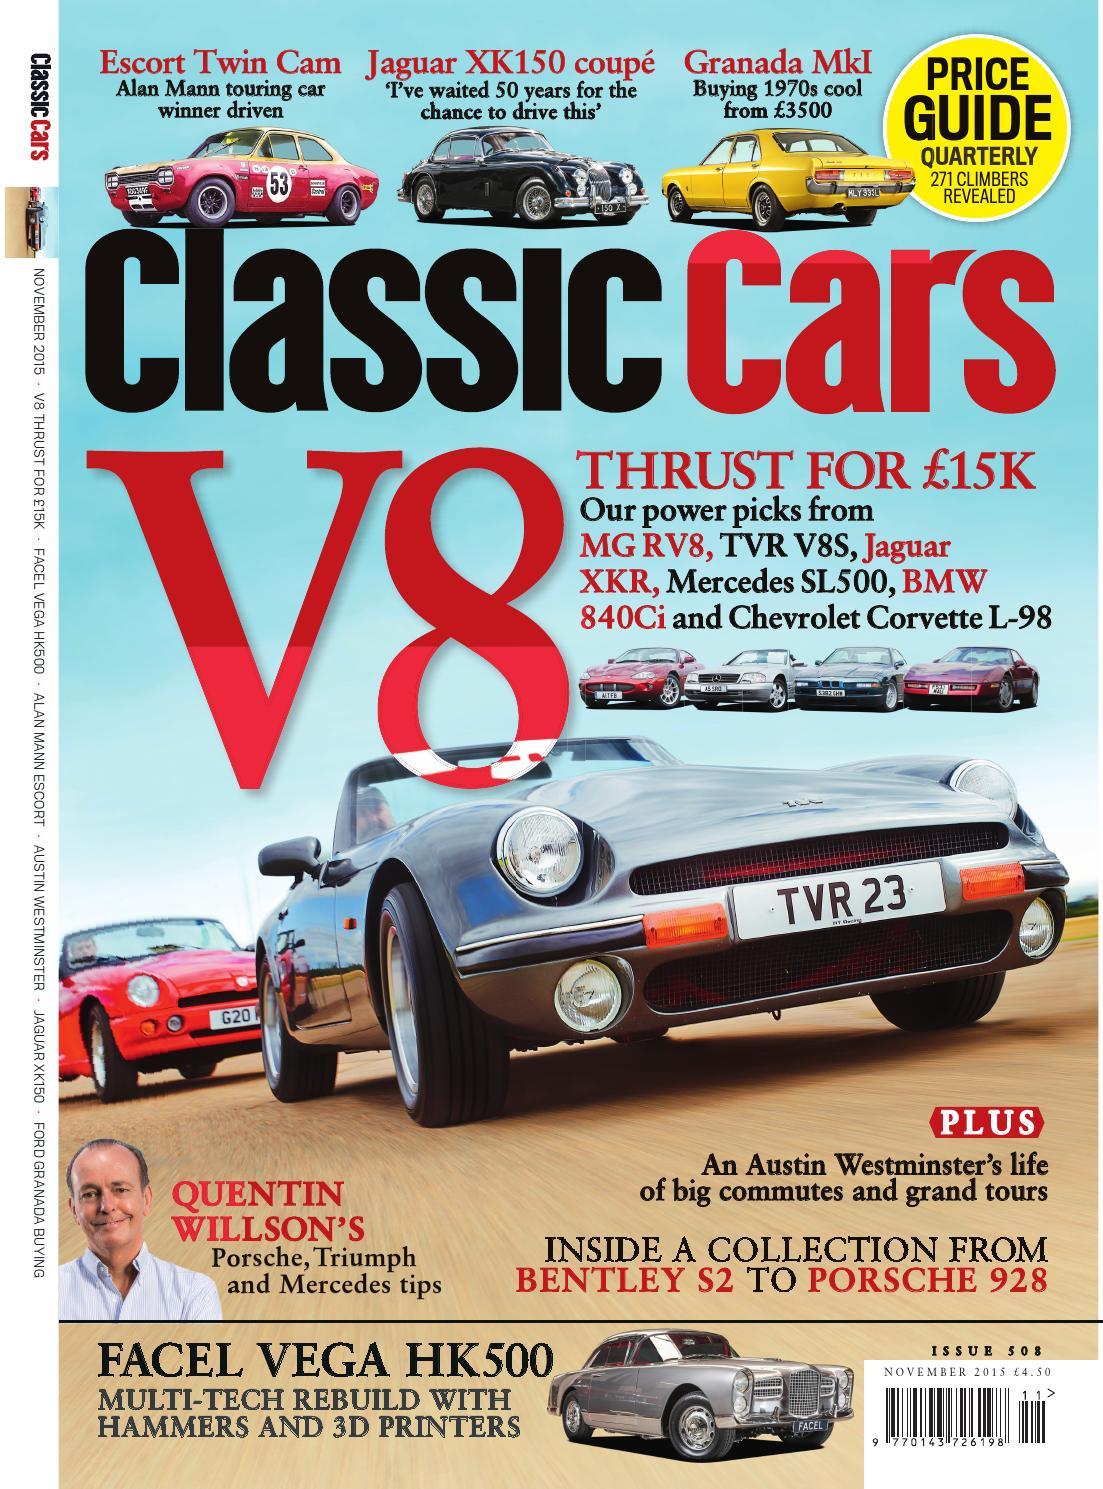 Classic cars M,agazine, November Issue by Classic Cars Magazine - issuu